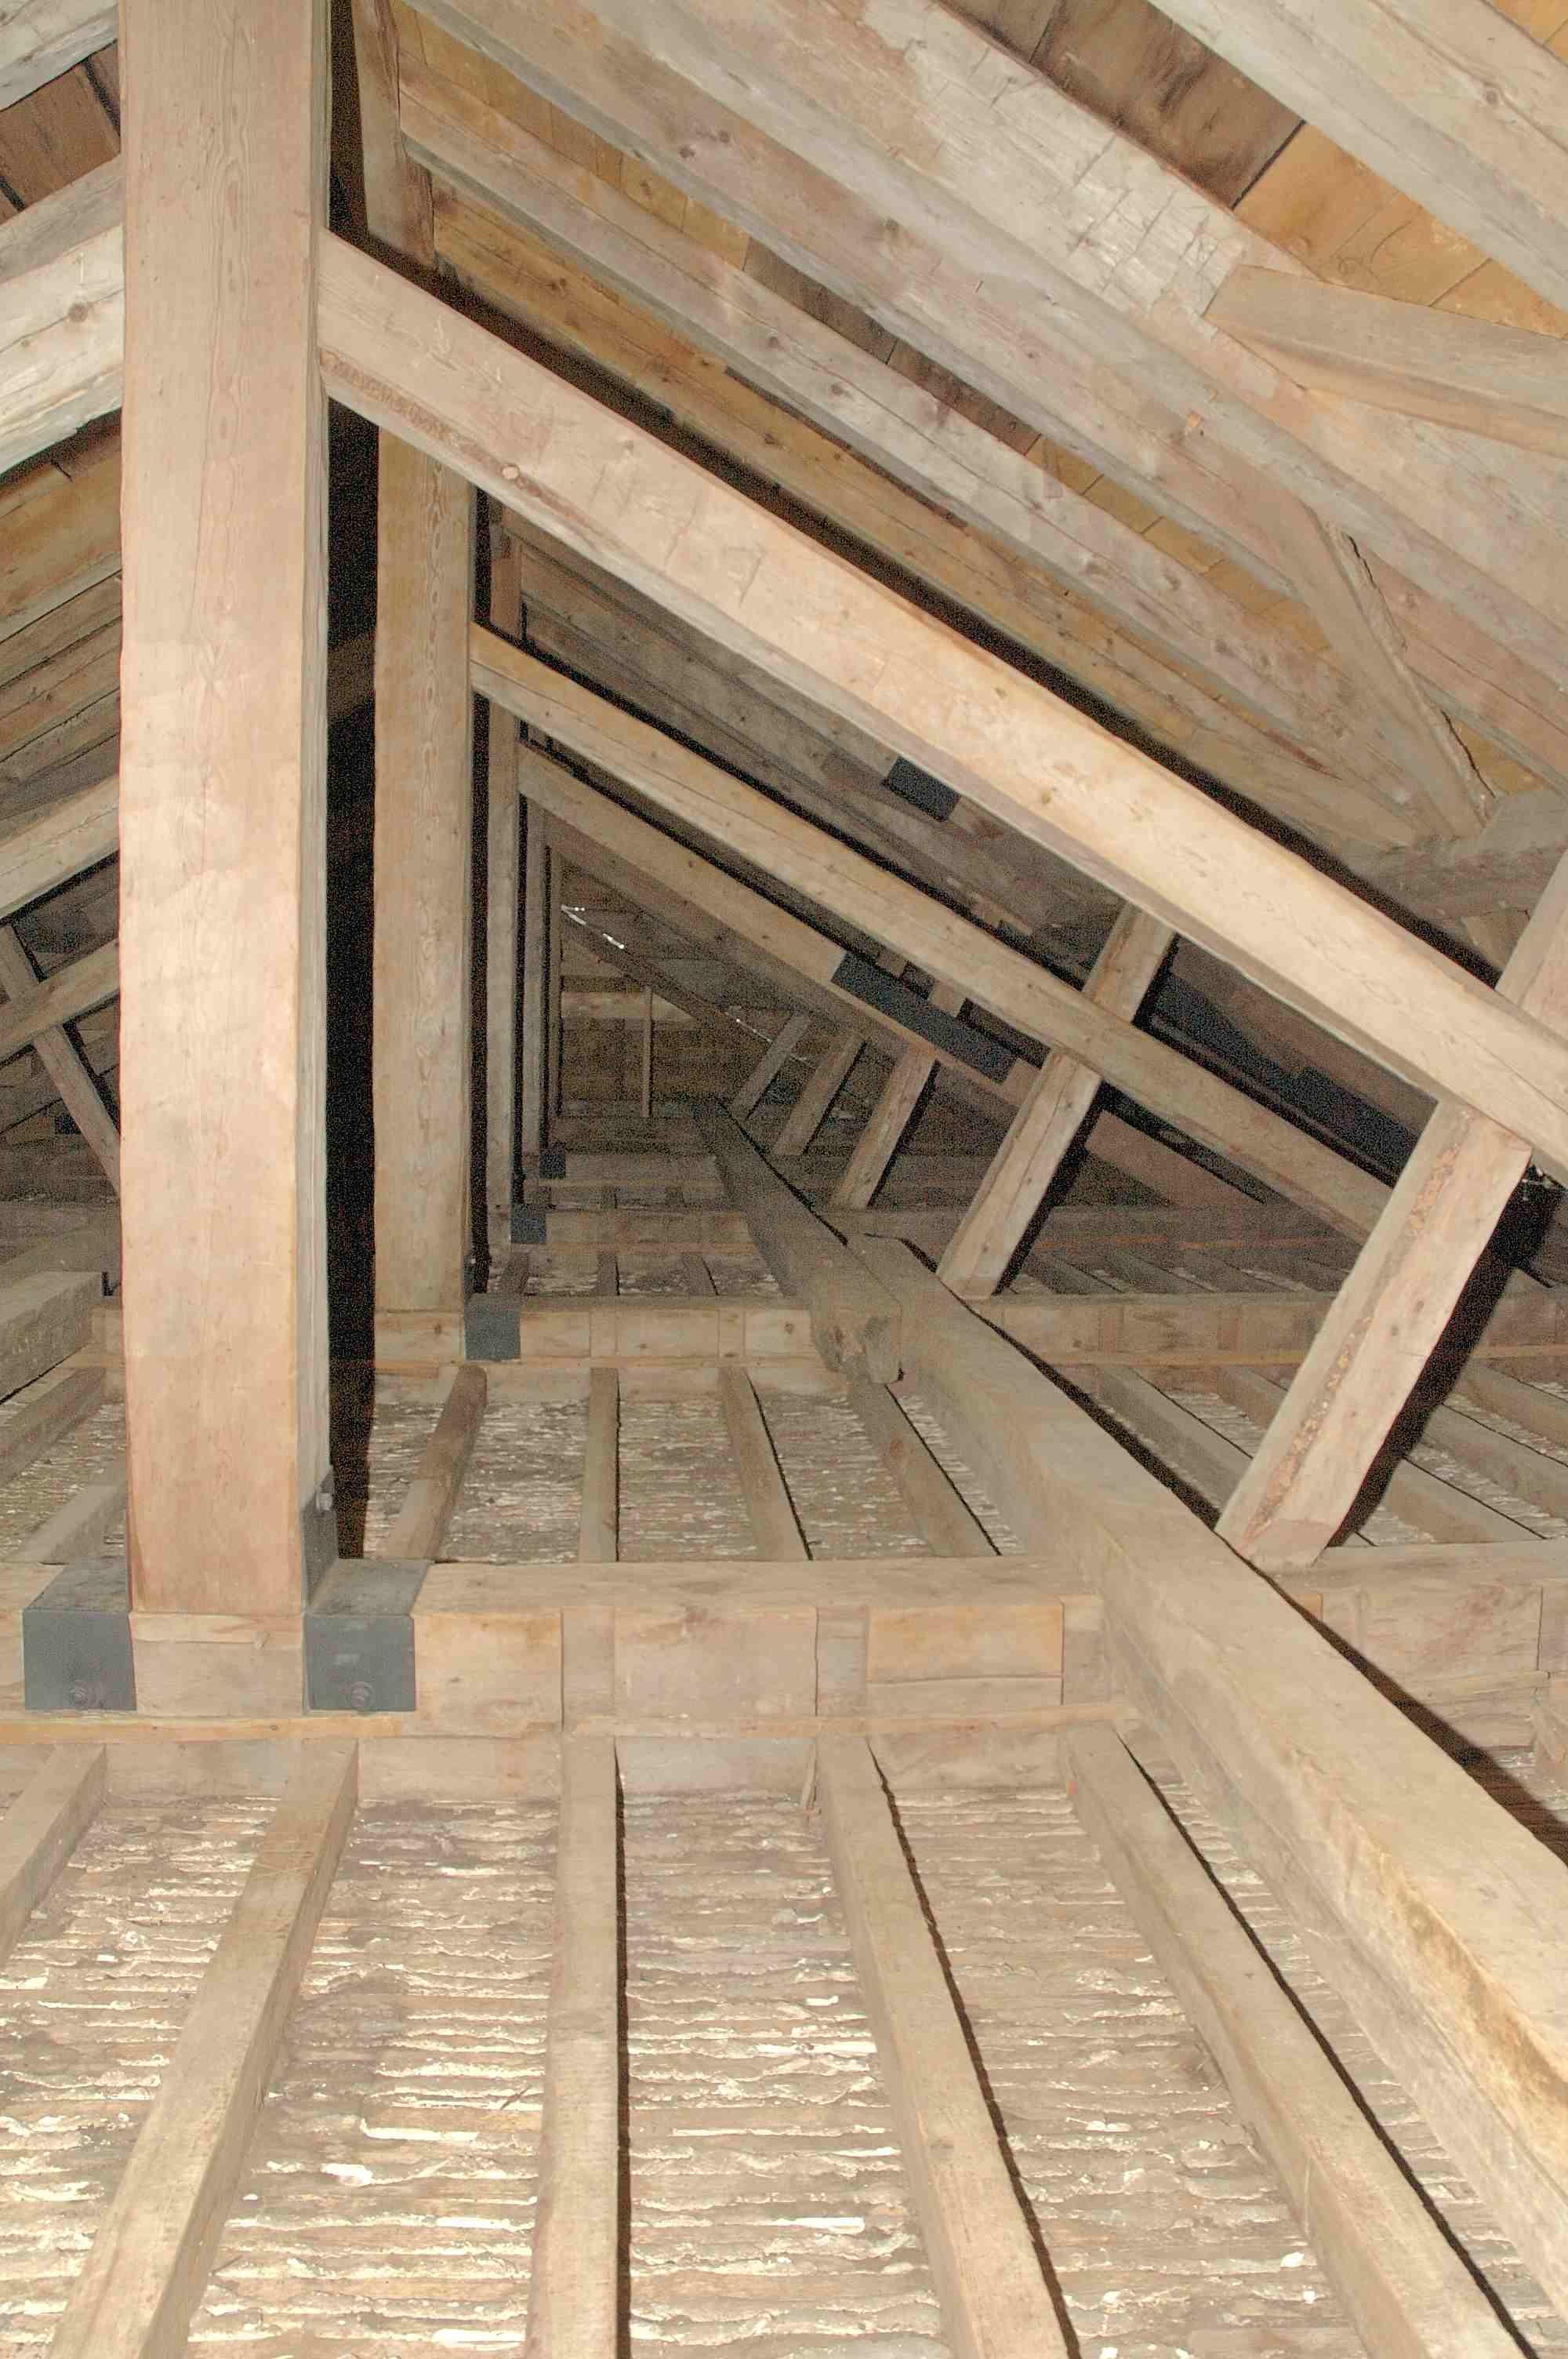 05 Roof interior